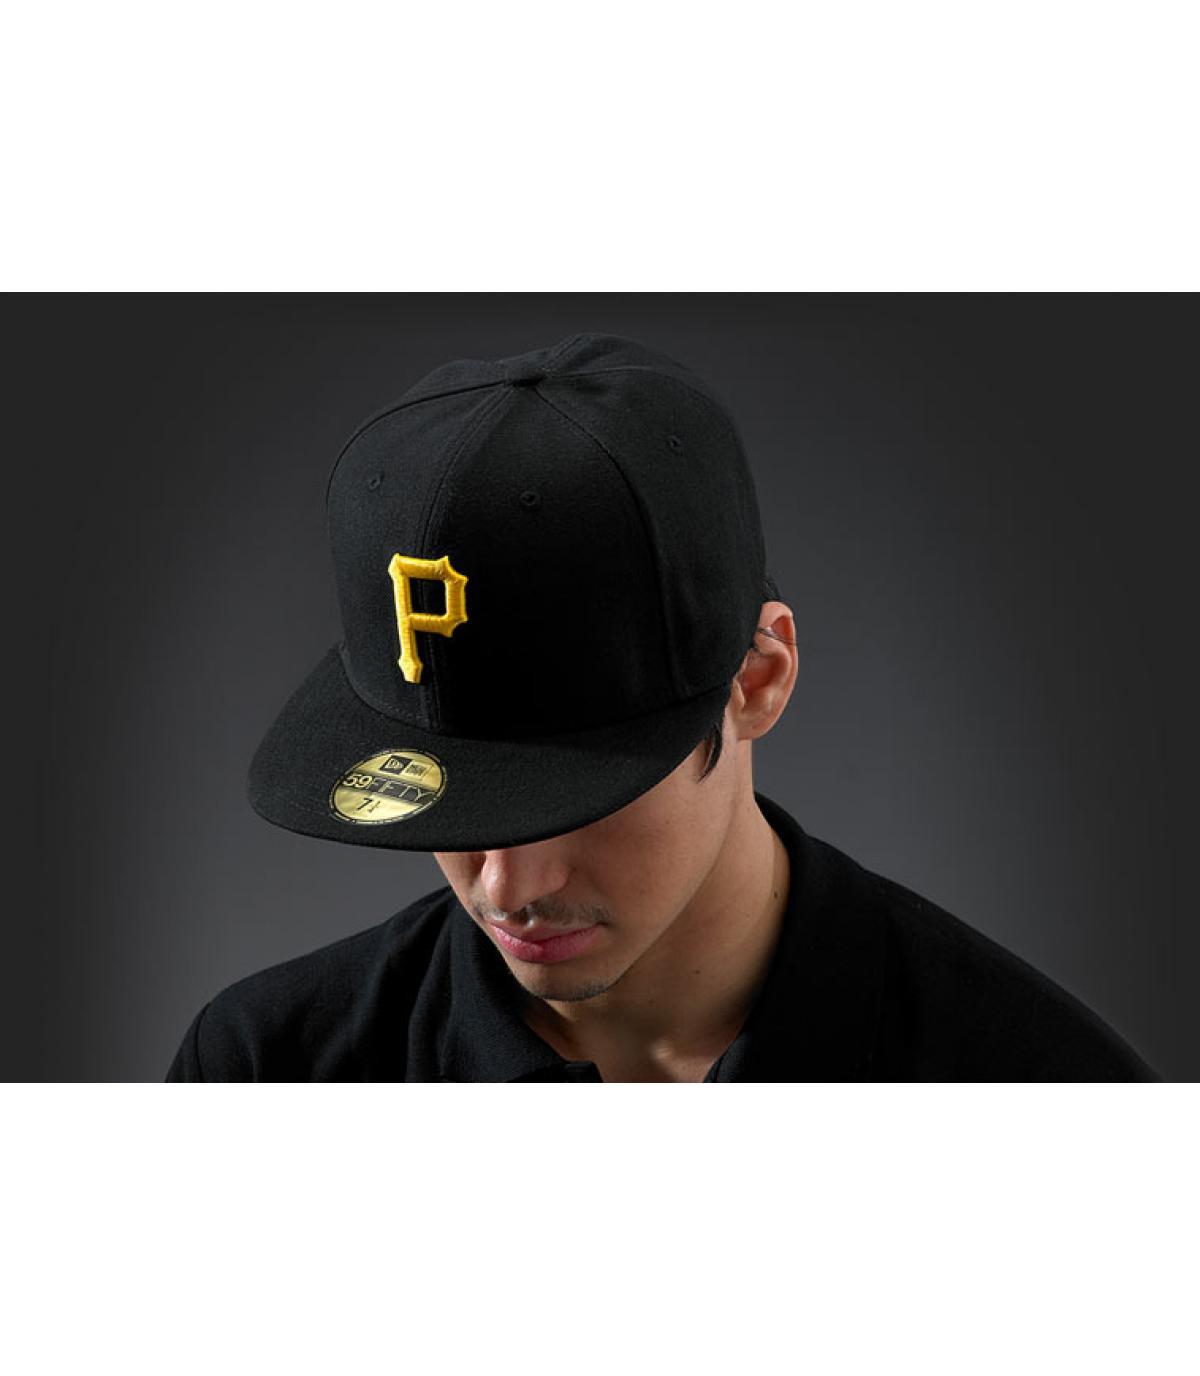 Casquette Pittsburgh noire